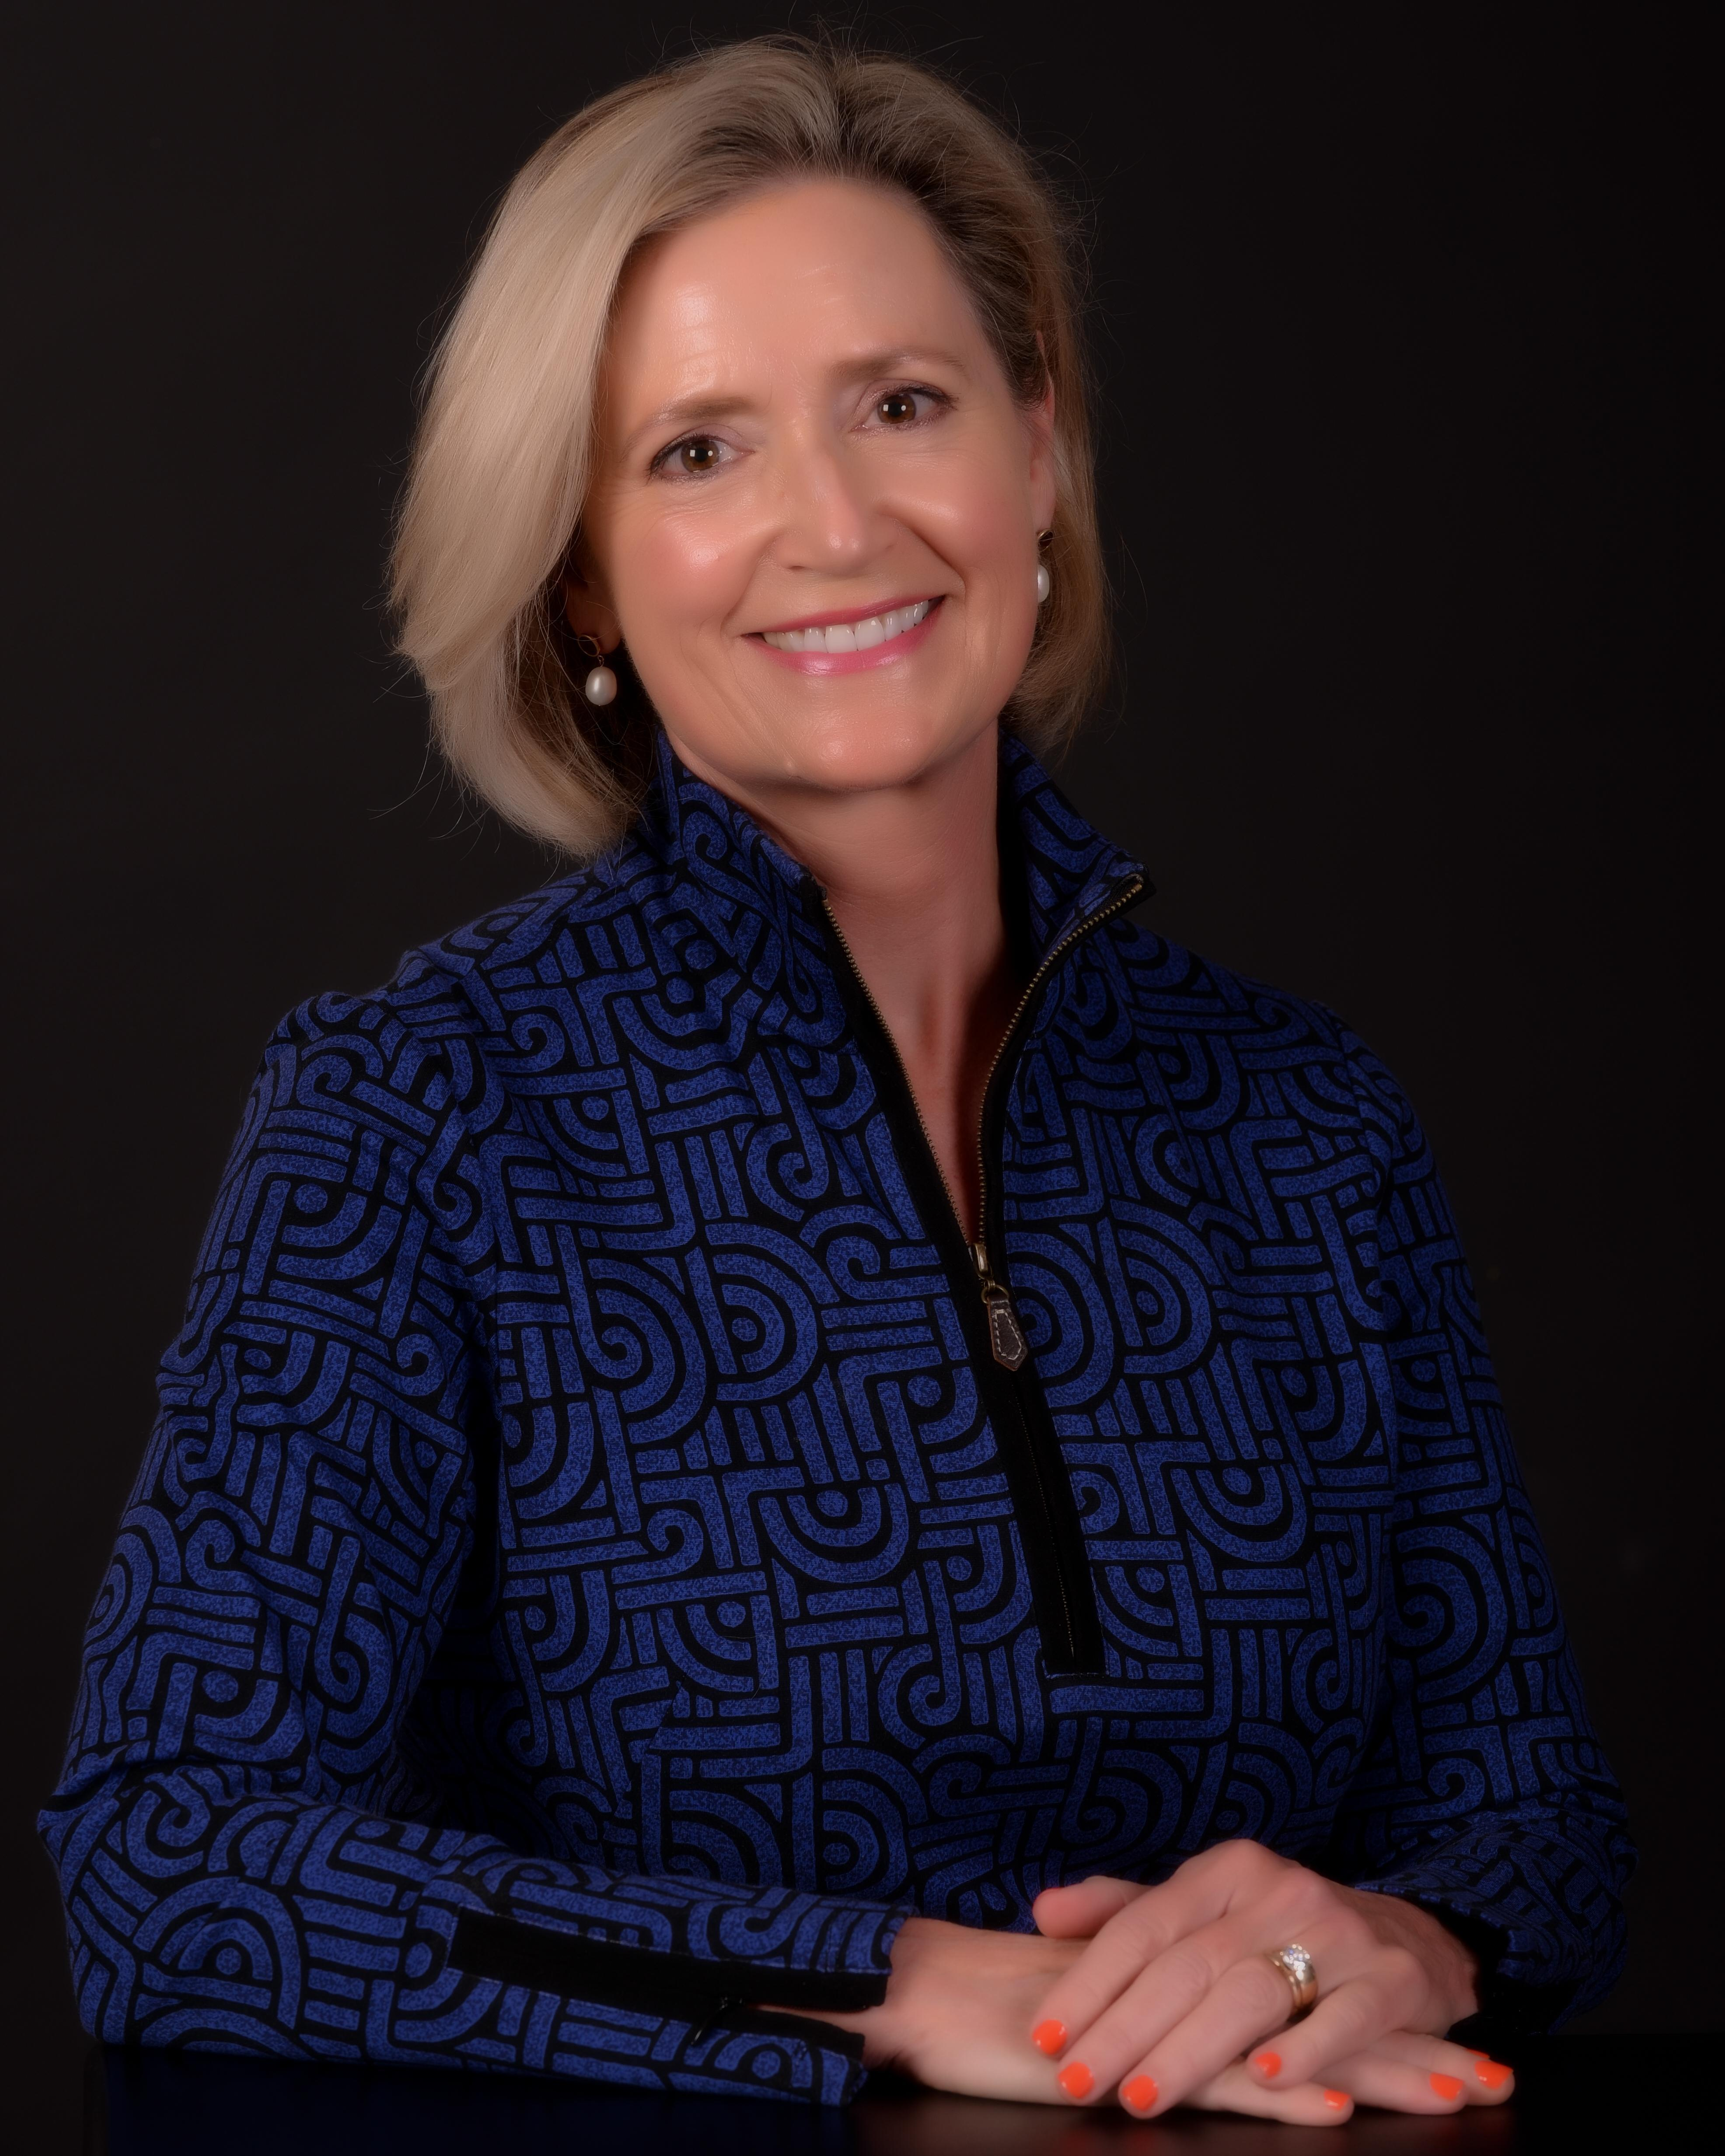 Cynthia Lee Smet